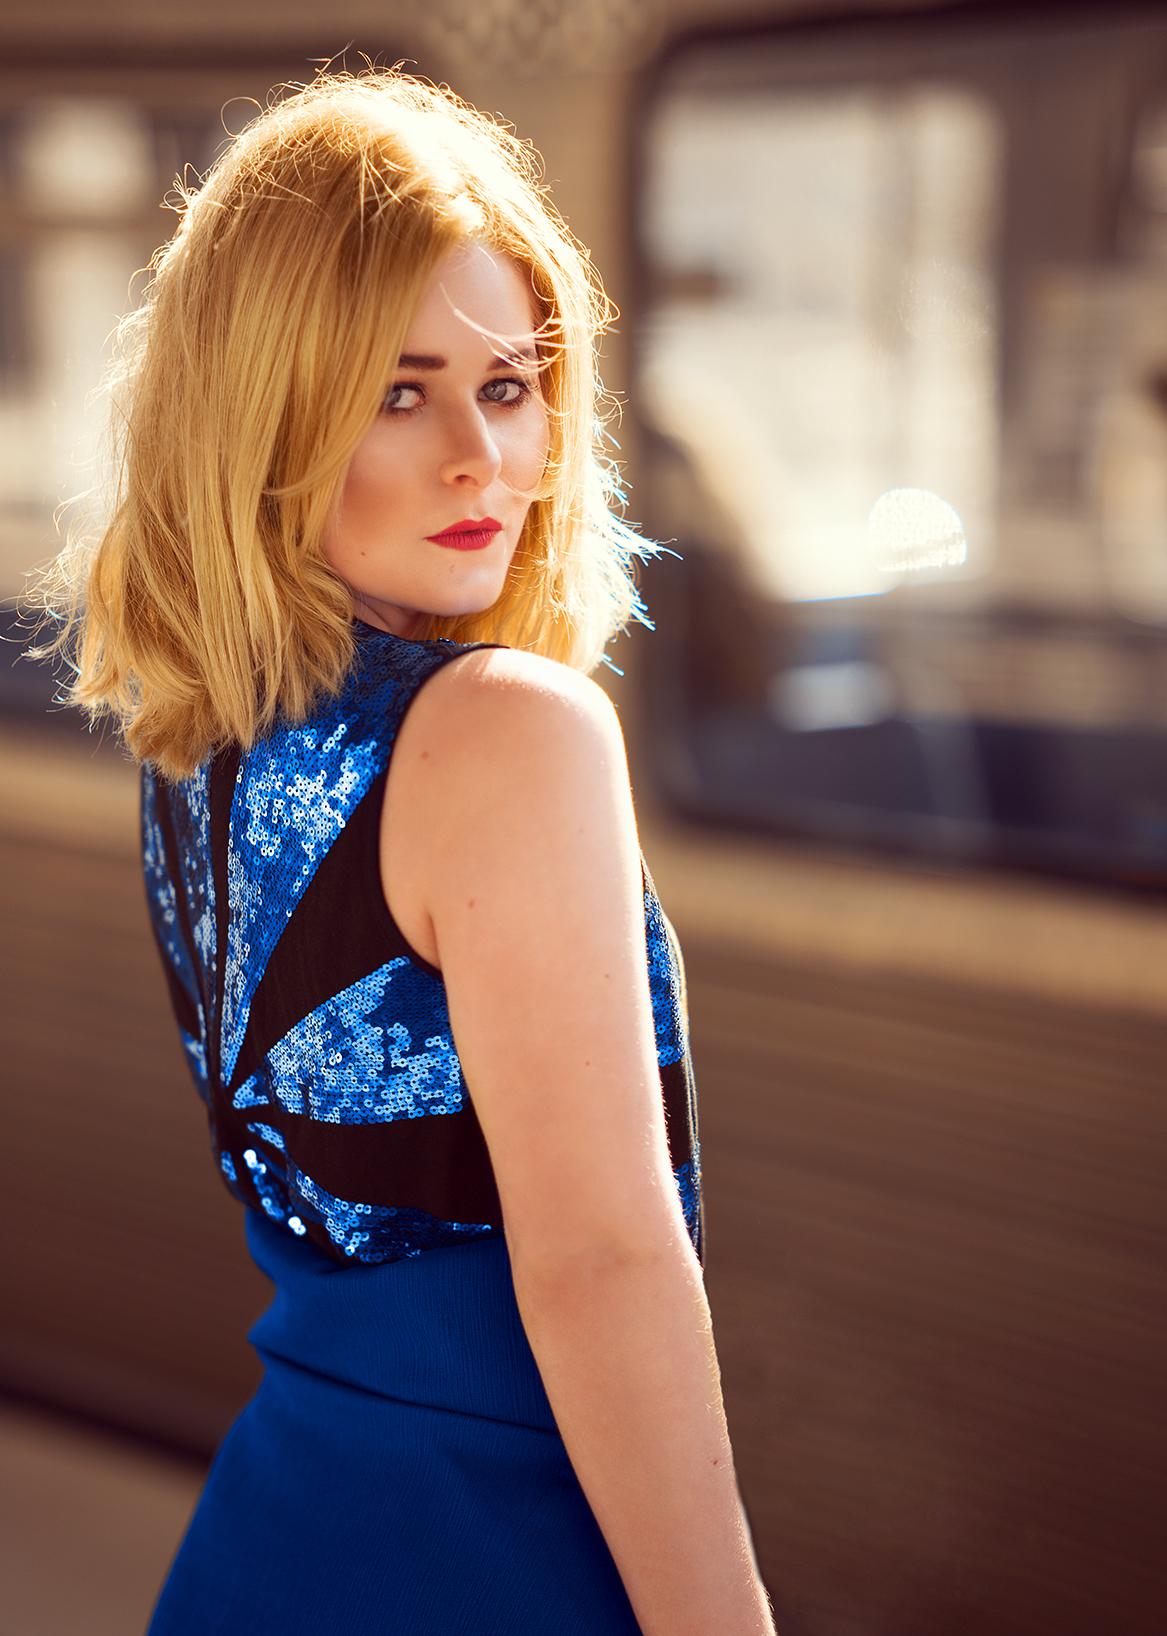 portrait-christina-key-blaues-kleid